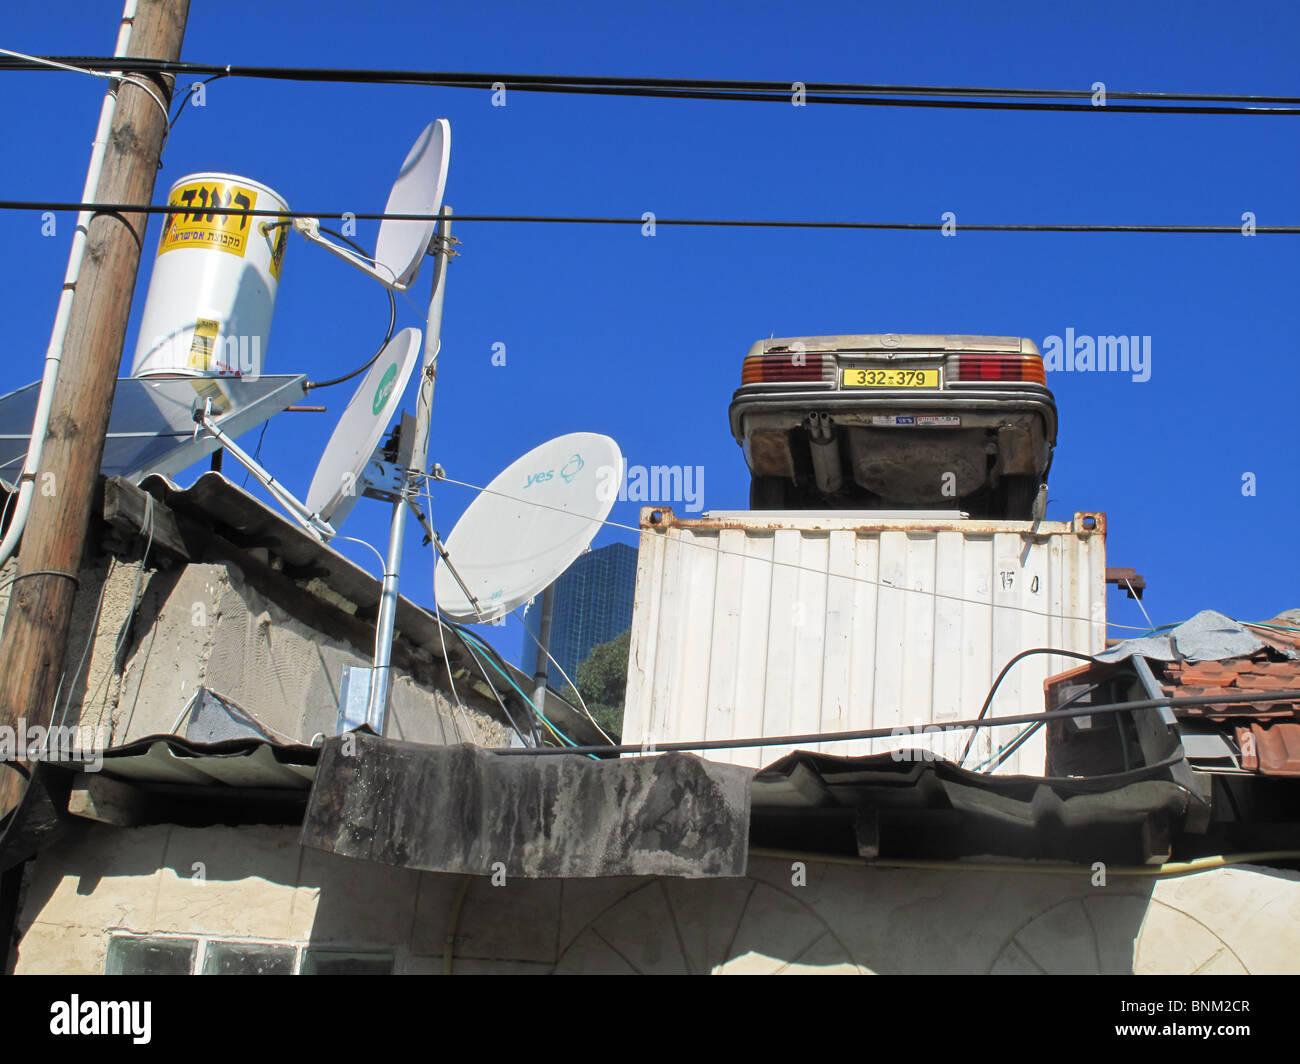 Rooftop scene in a shabby industrial area Tel Aviv israel Stock Photo